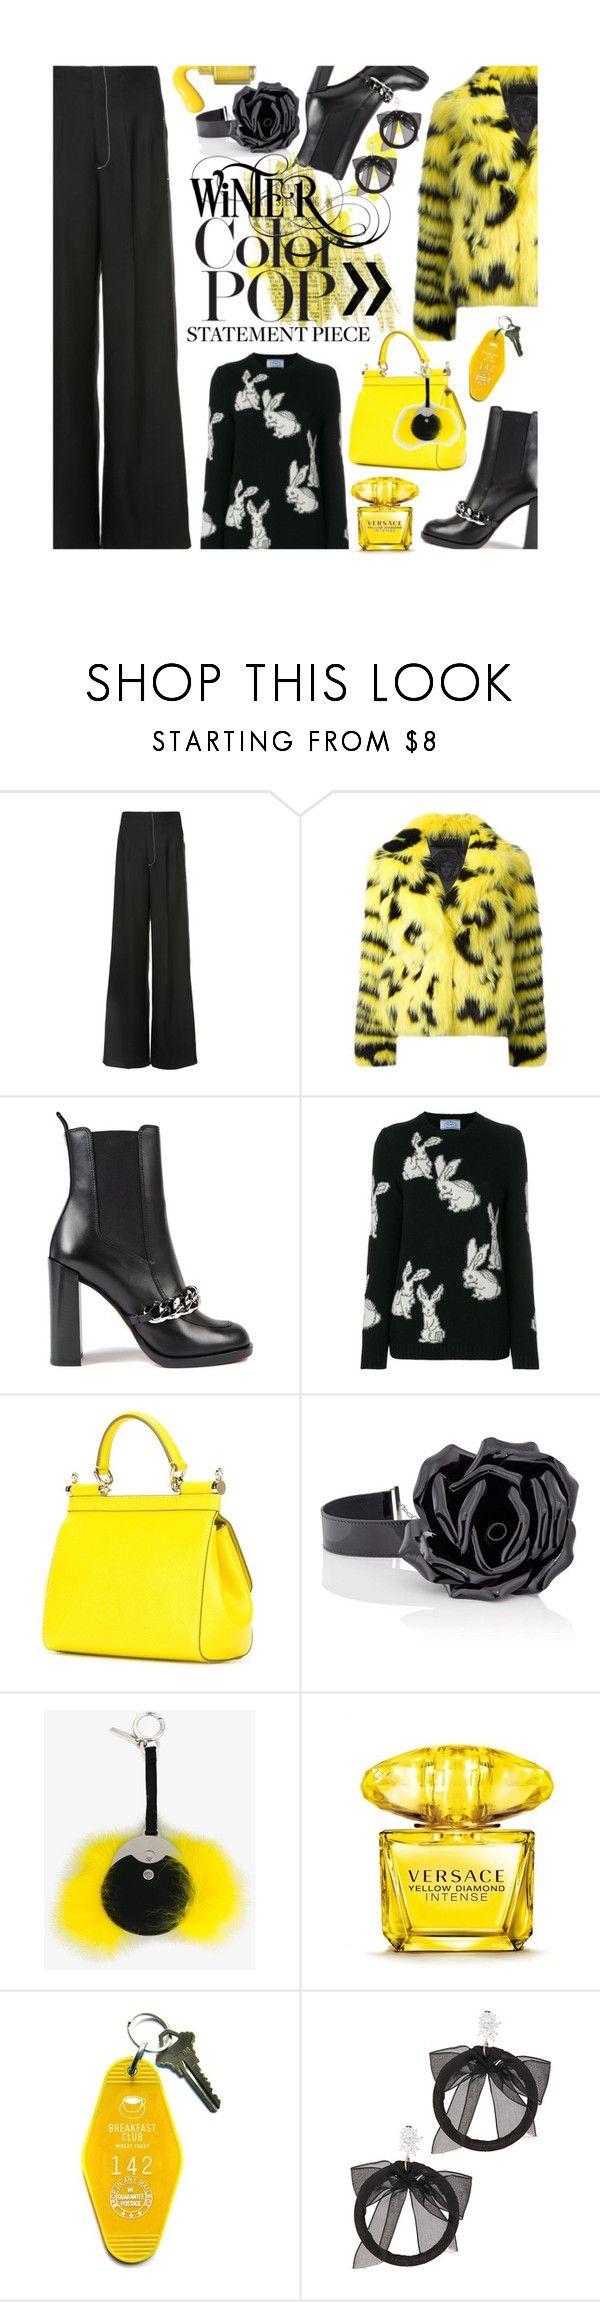 """Statement Coat"" by mia-christine ❤ liked on Polyvore featuring Derek Lam, Versace, Givenchy, Prada, Dolce&Gabbana, Yves Saint Laurent, Fendi, Three Potato Four, Fallon and statementcoats"